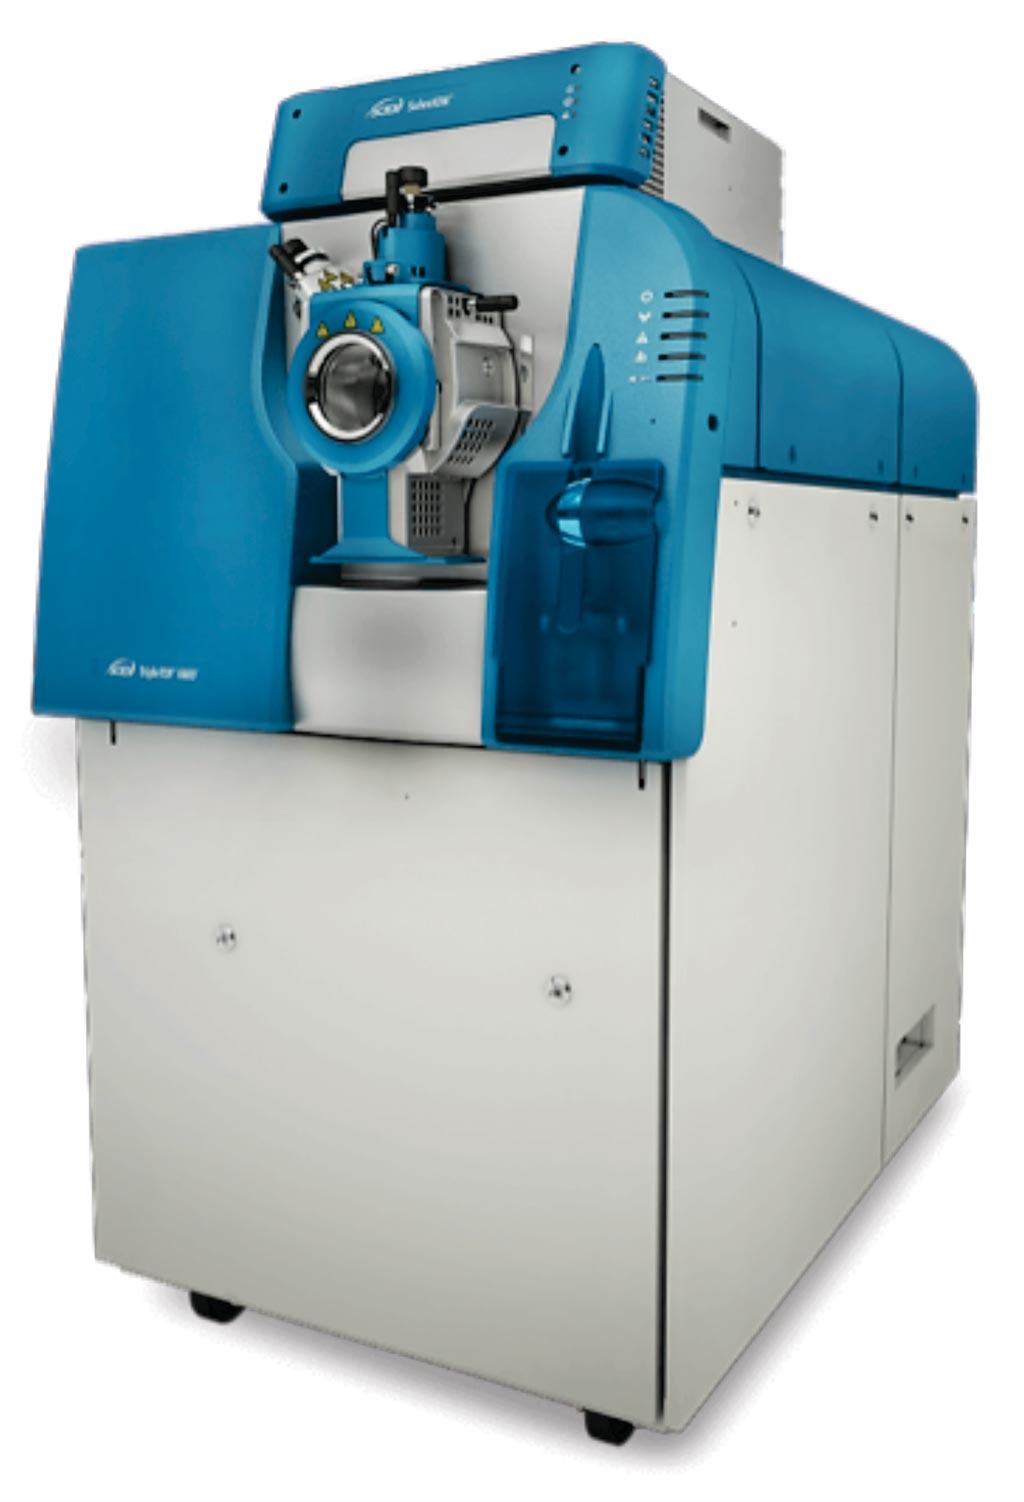 Image: The TripleTOF 6600 Quadrupole Time-Of-Flight (QTOF) mass analyzer (Photo courtesy of Sciex).